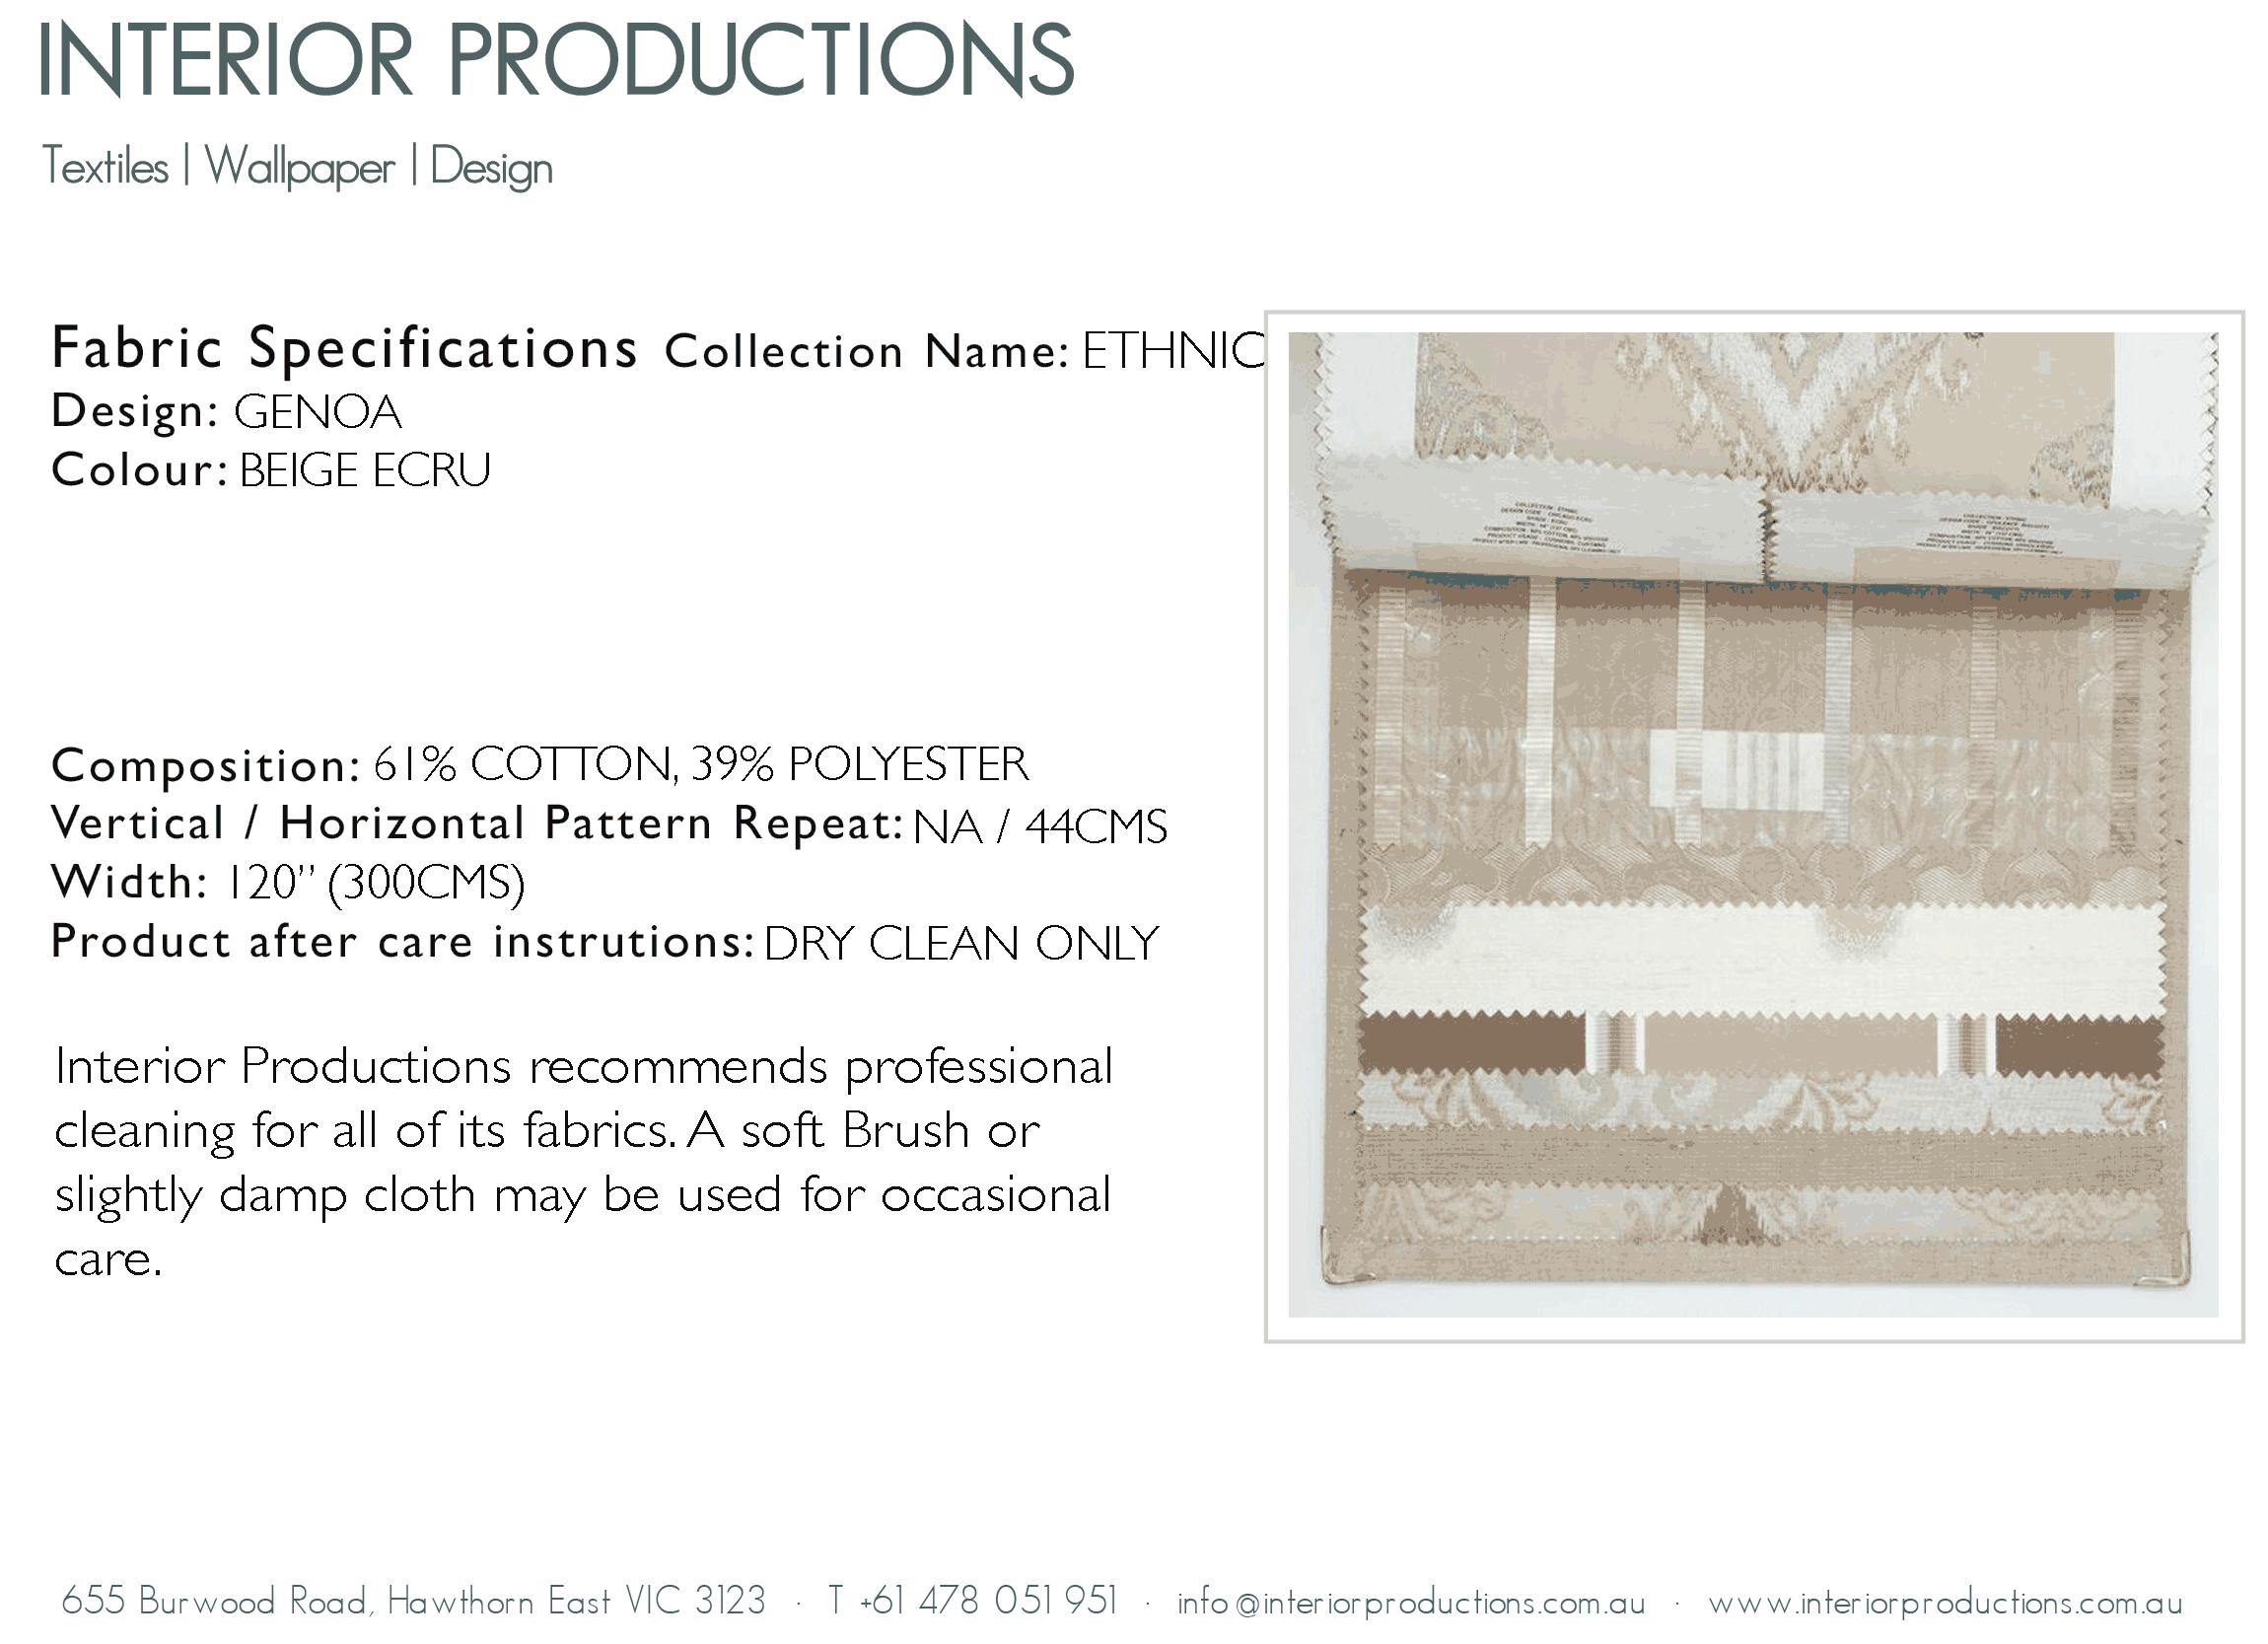 interior_productions_GENOA---BEIGE-ECRU